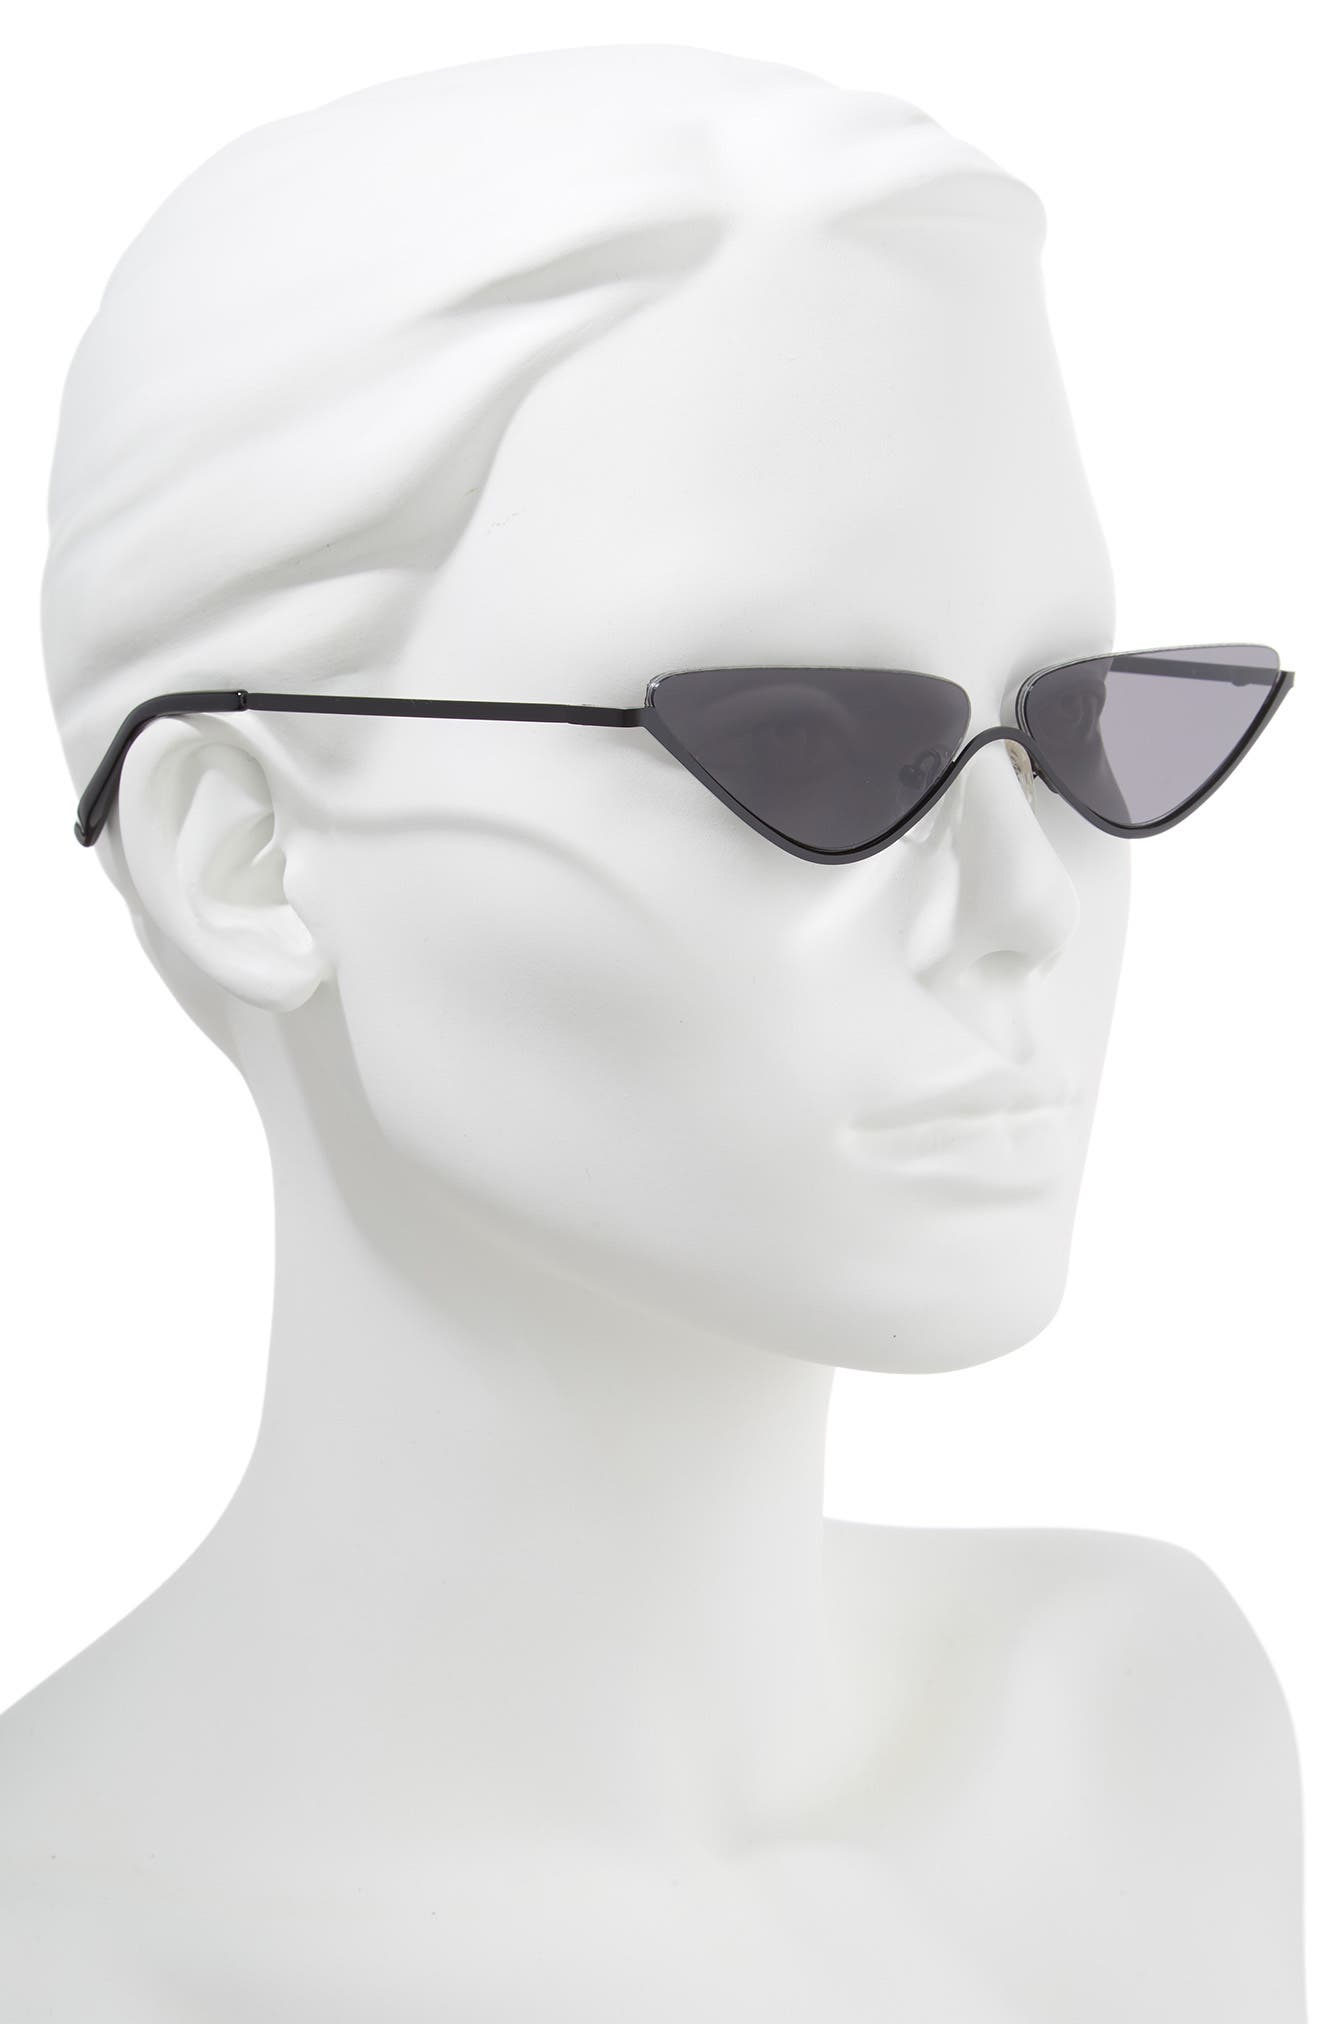 62mm Half Rim Cat Eye Sunglasses,                             Alternate thumbnail 2, color,                             001